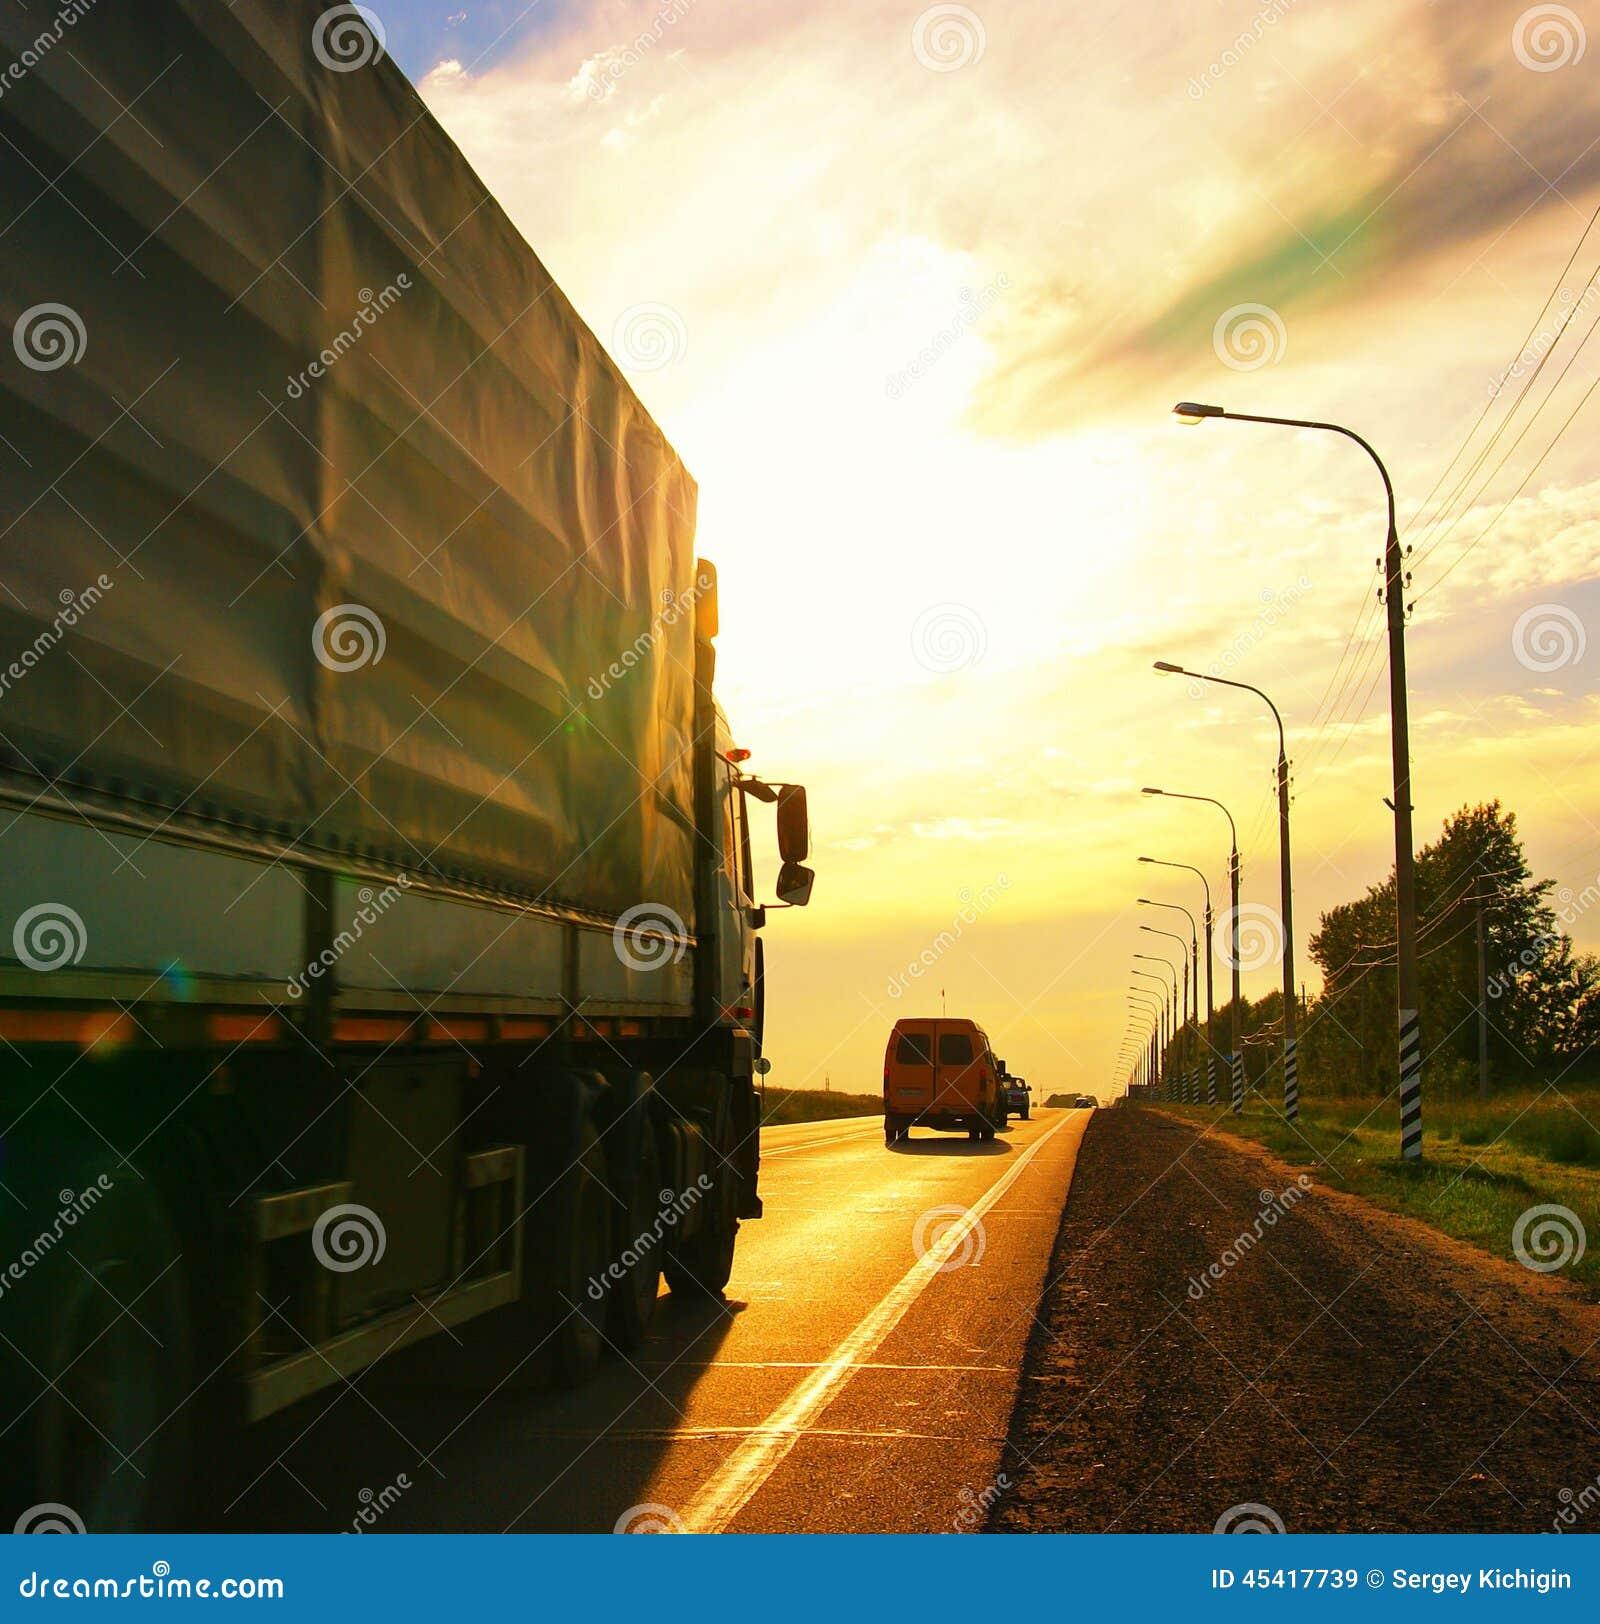 Road route blur truck russia